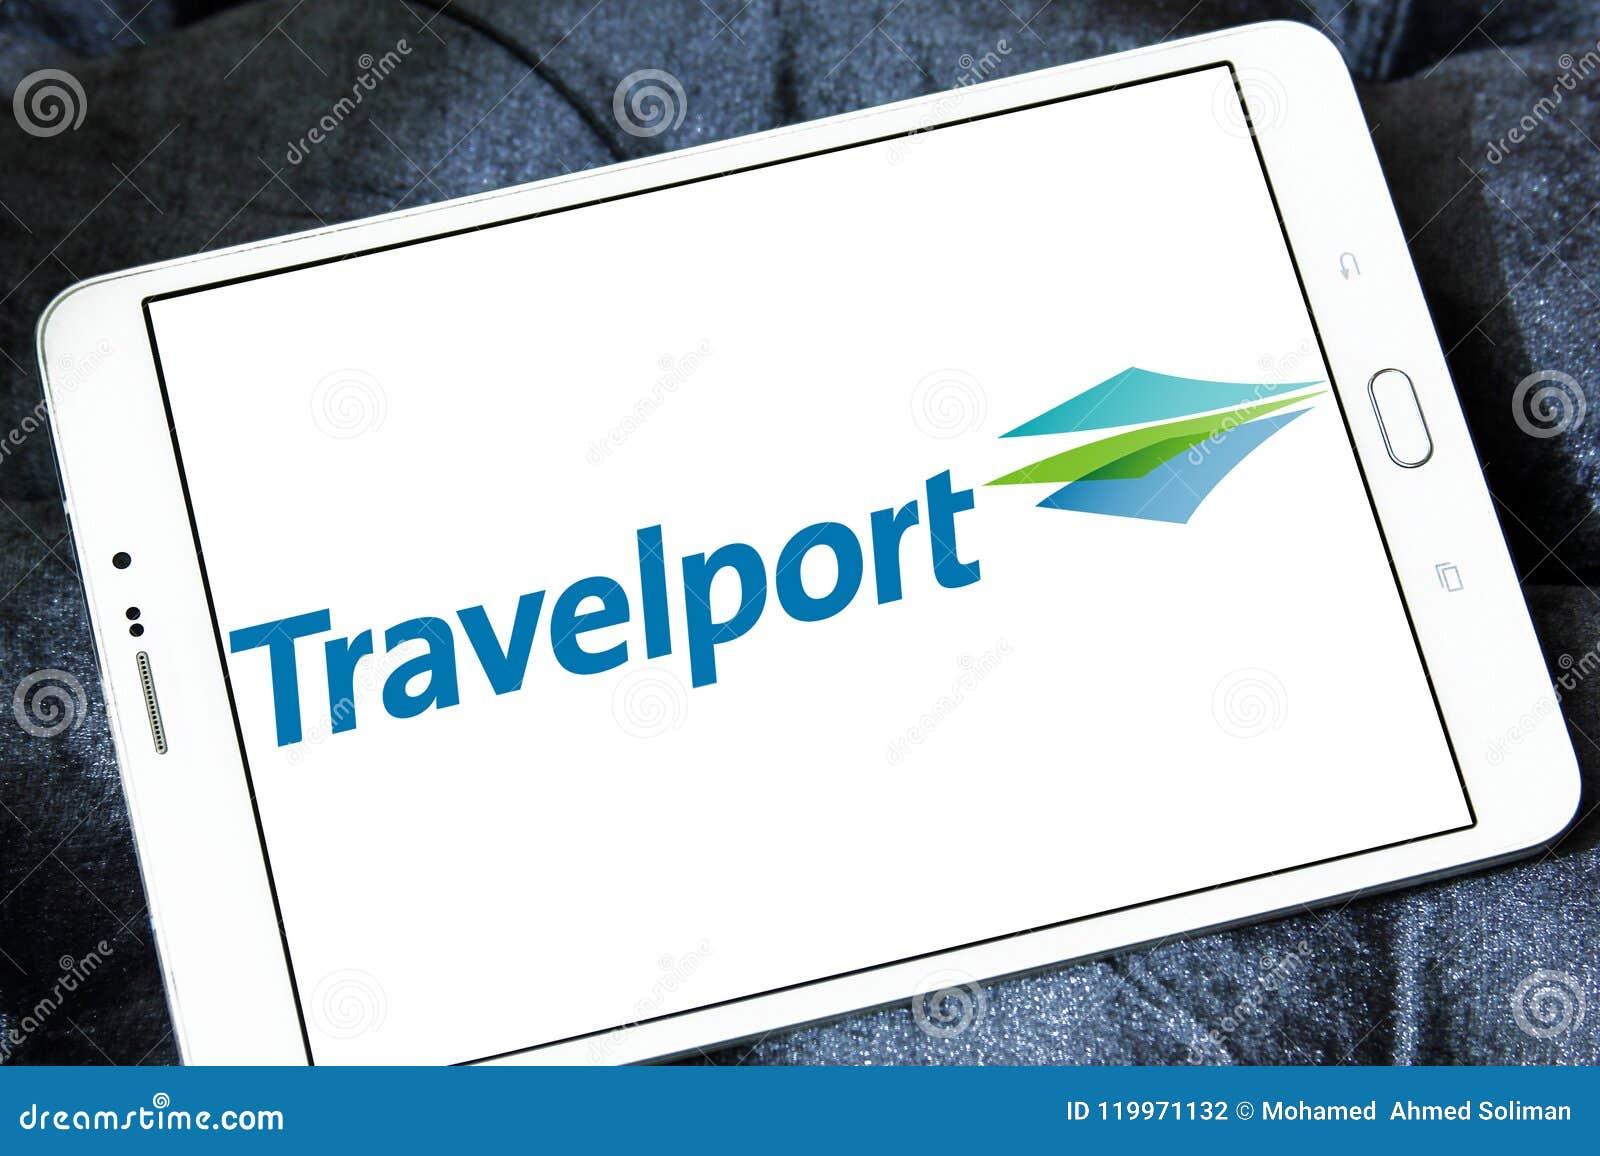 Логотип компании Travelport